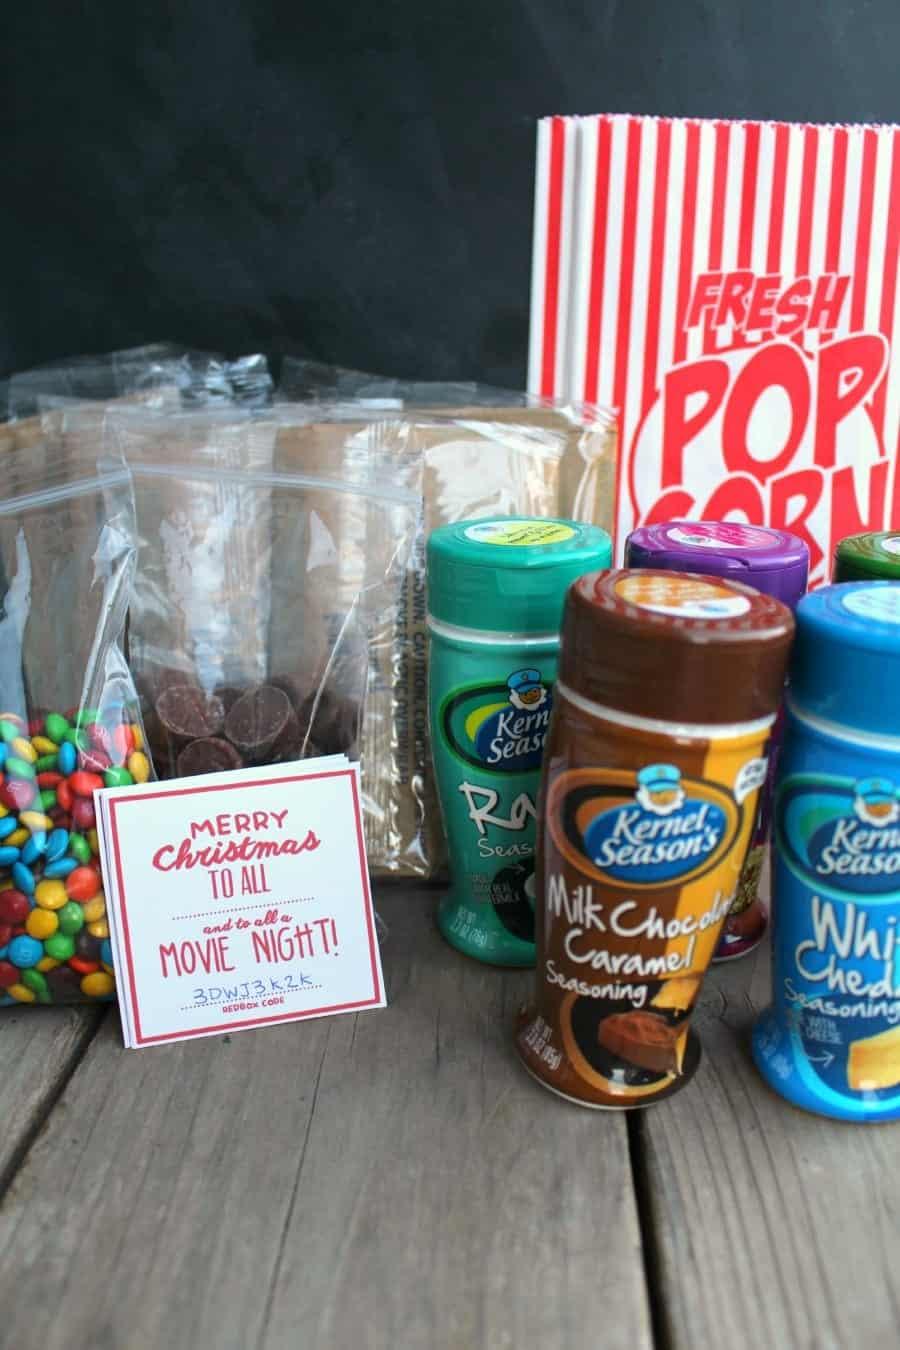 movie night neighbor gift with redbox code